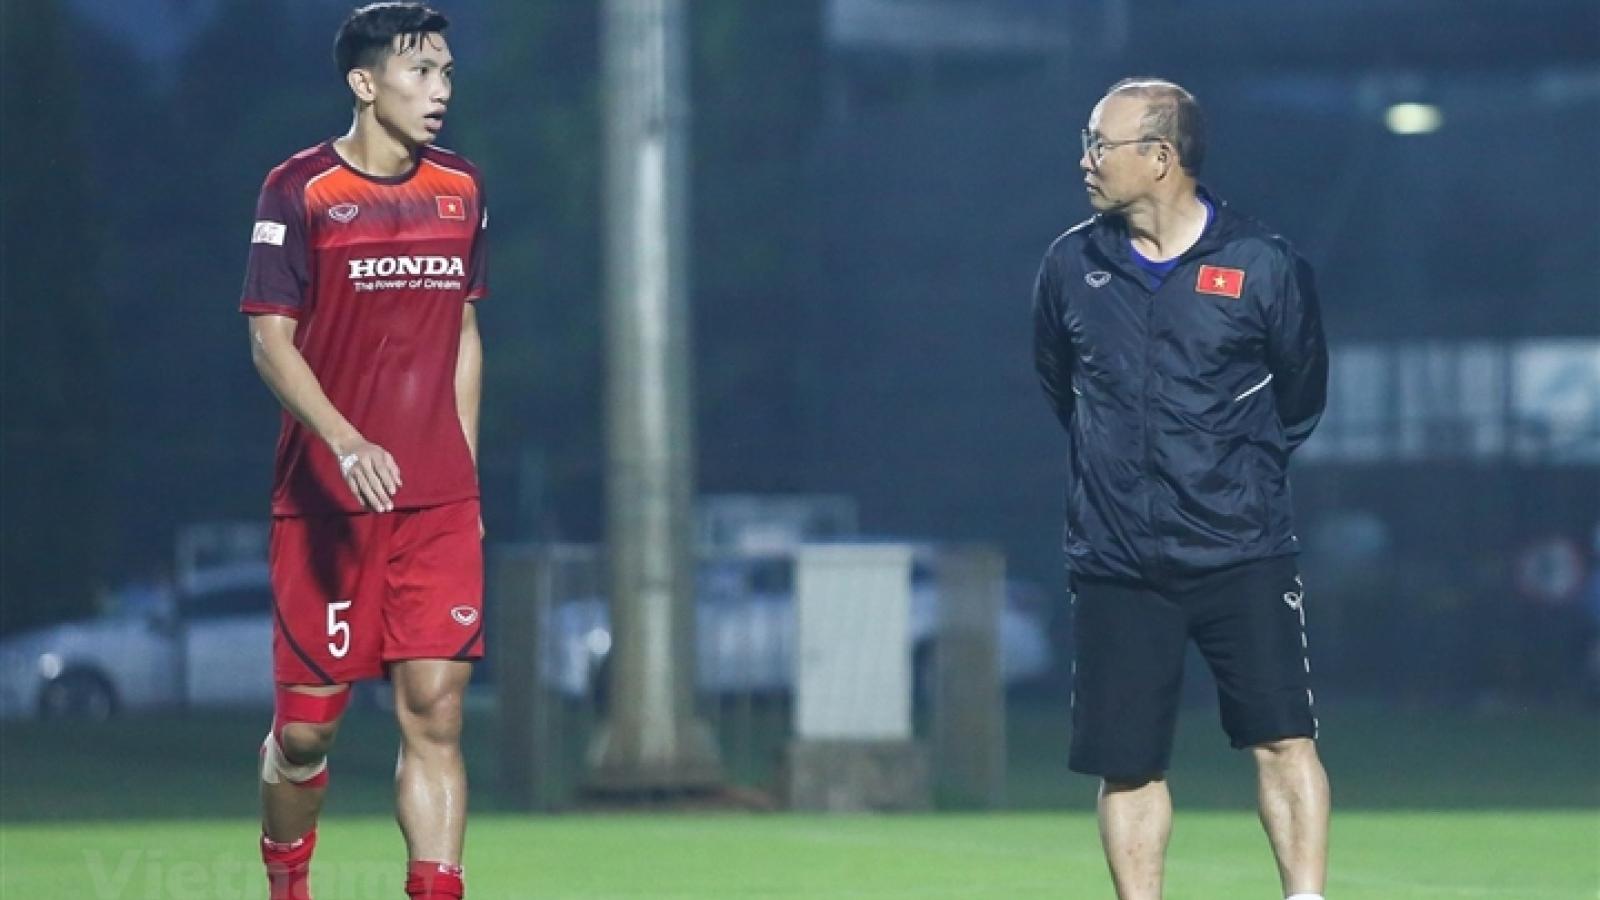 Van Hau to miss World Cup qualifiers due to injury